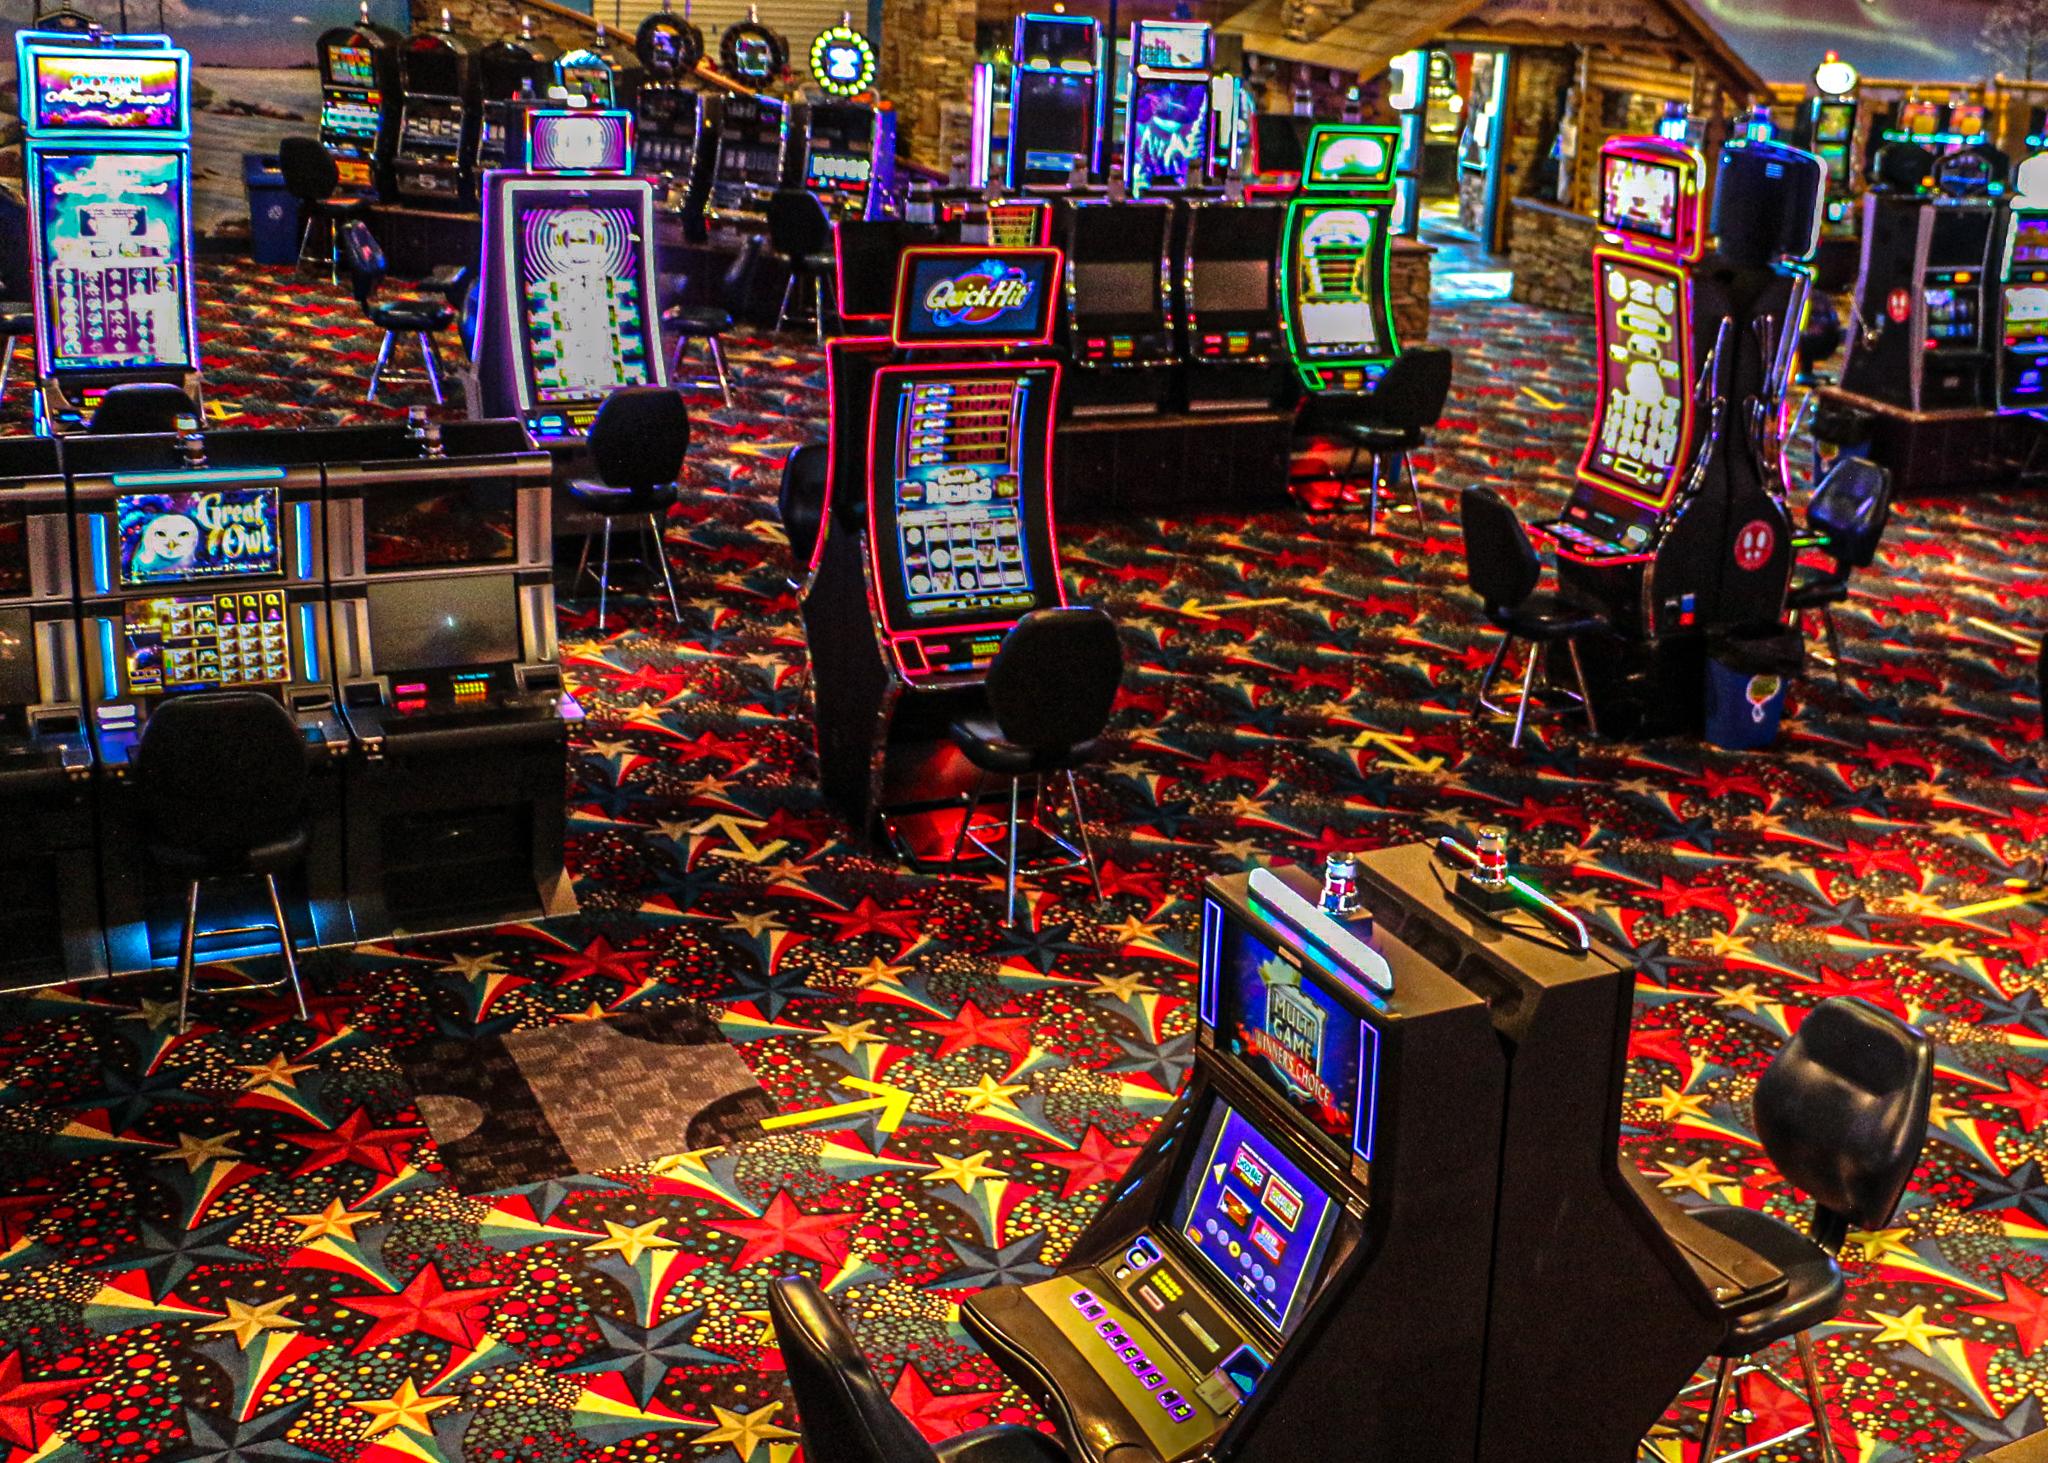 Slot Machine Landscape photo showing the entrance way2